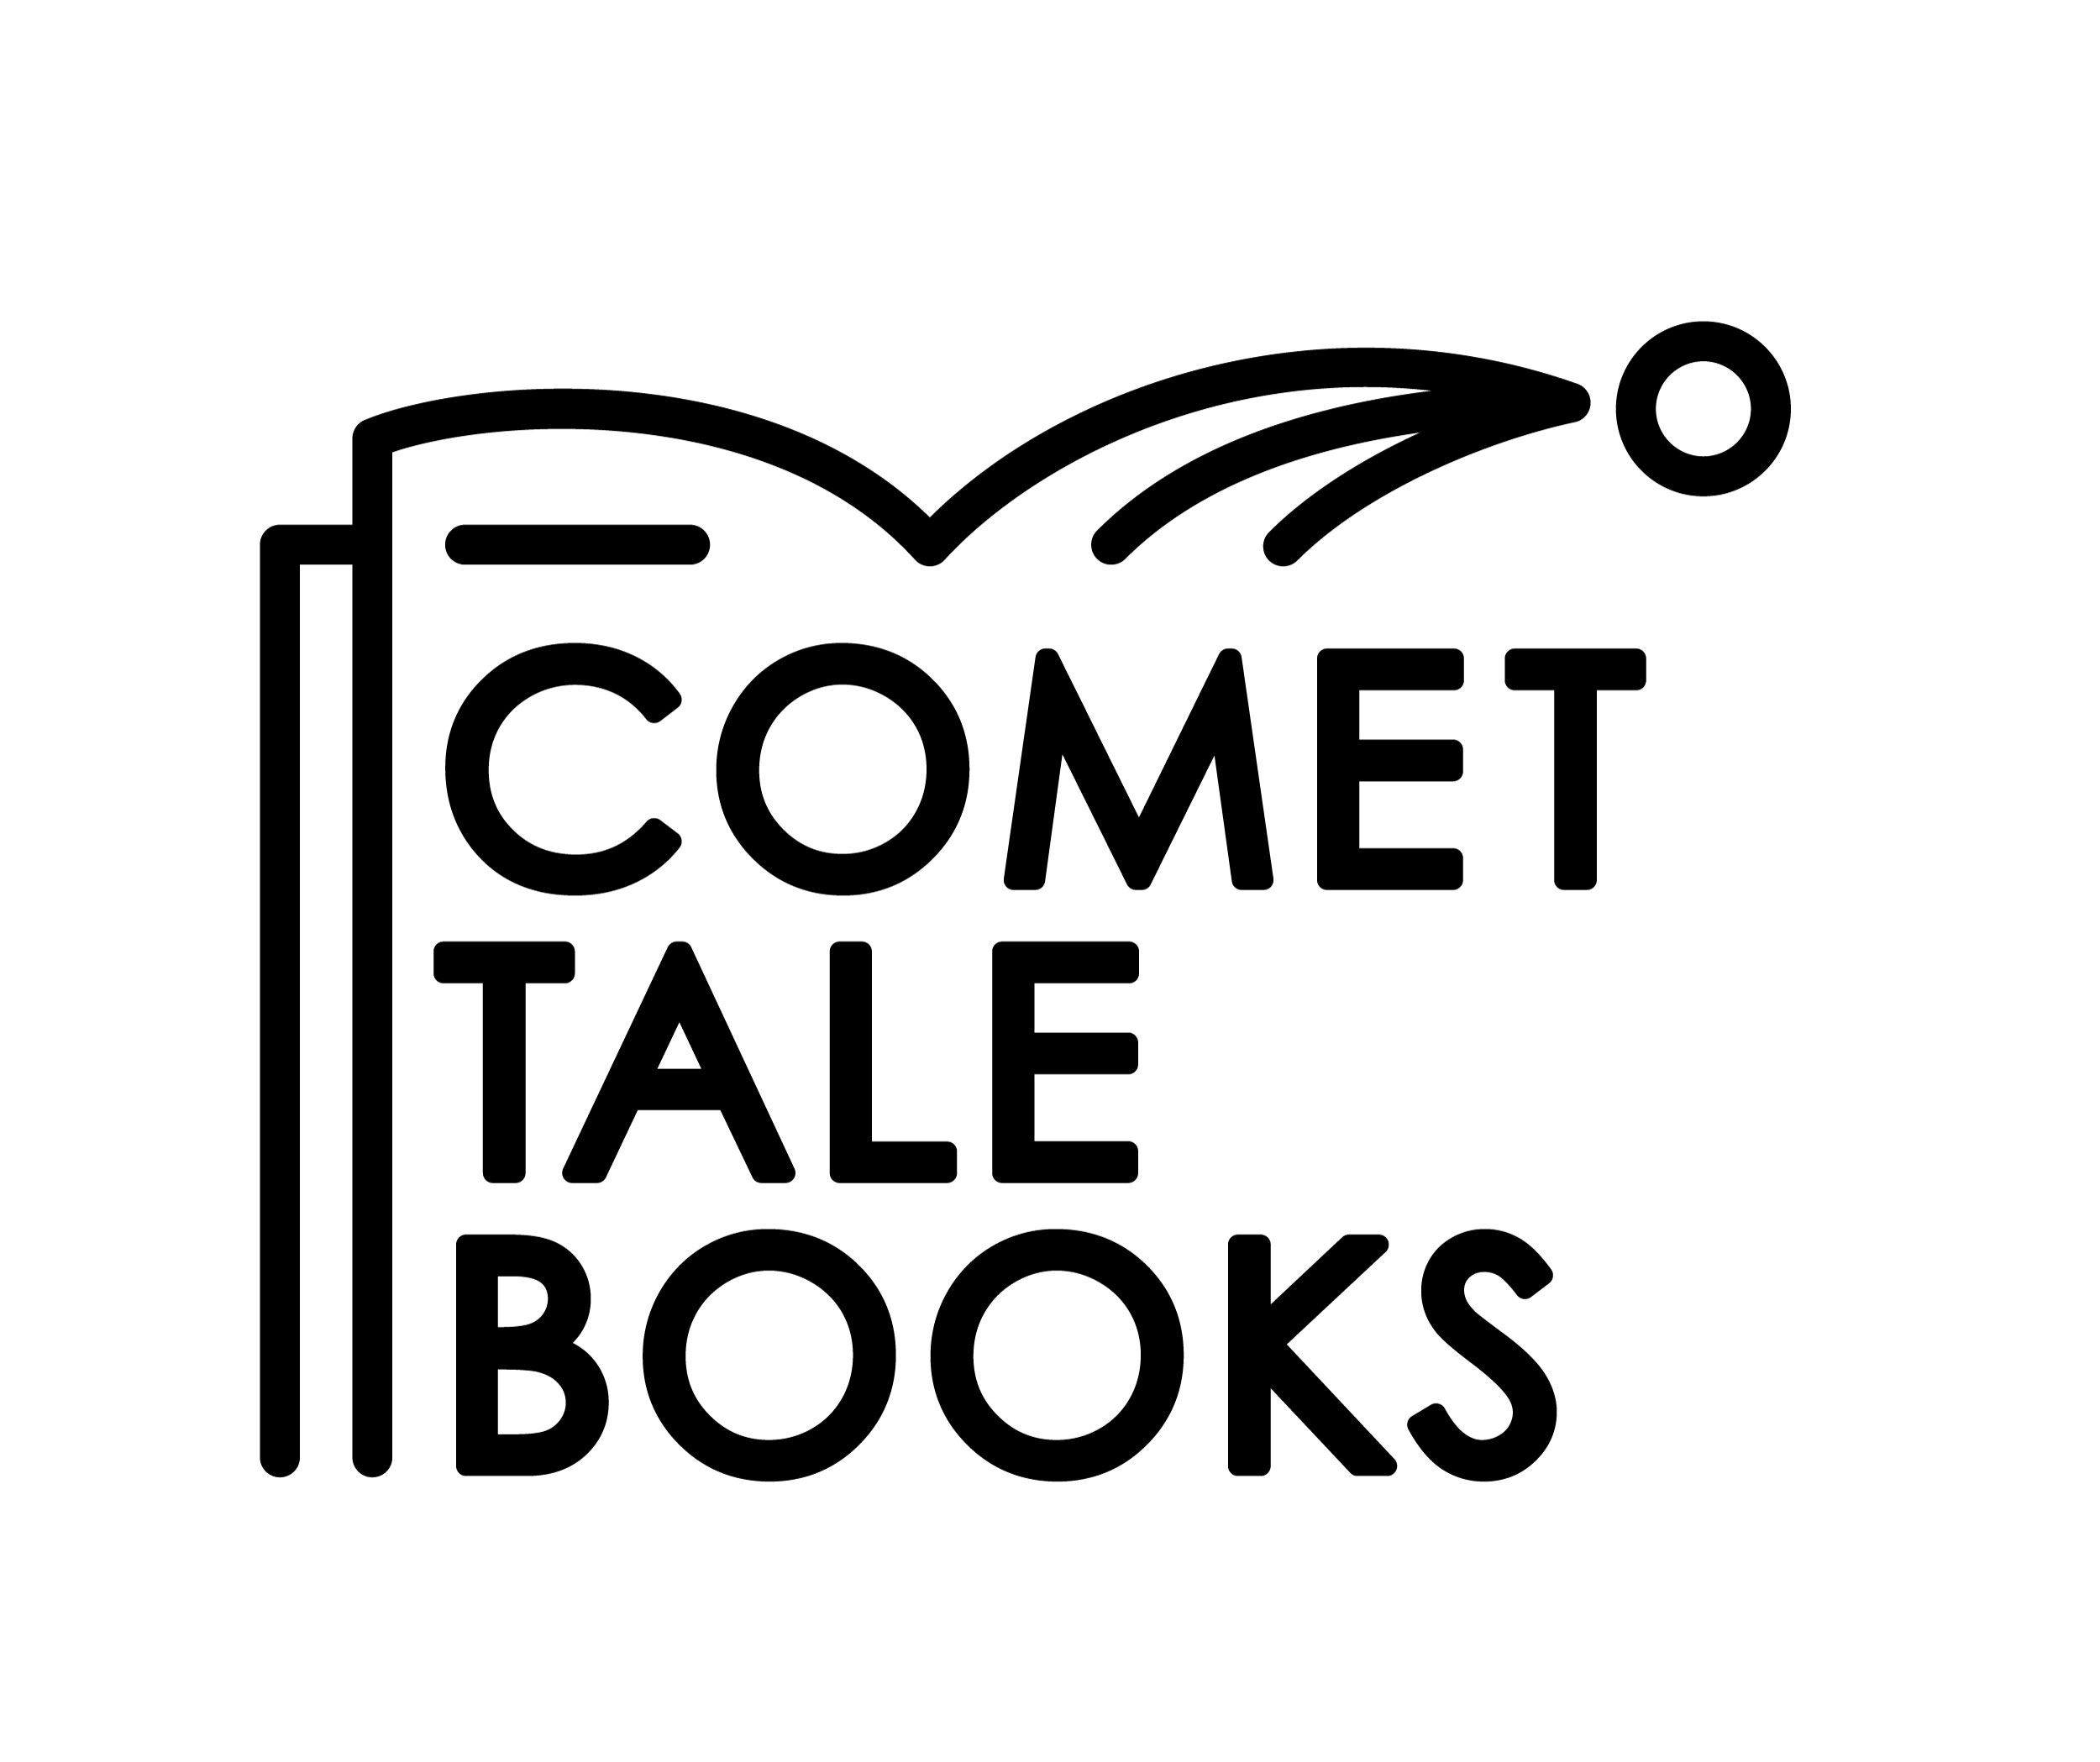 Comet-Tale-Books-Logo.jpg